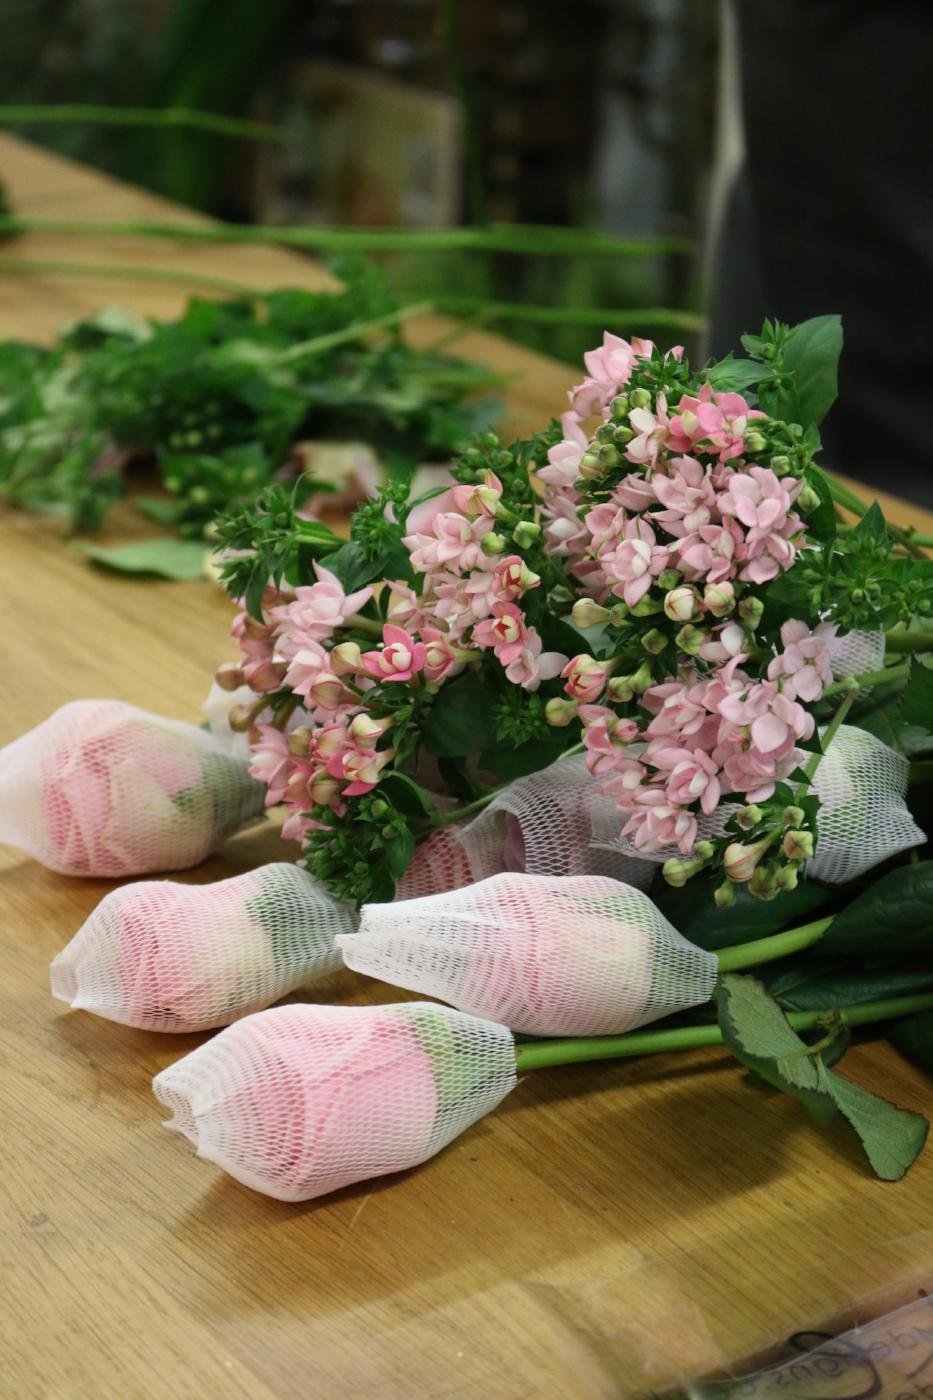 Flowers ordered online